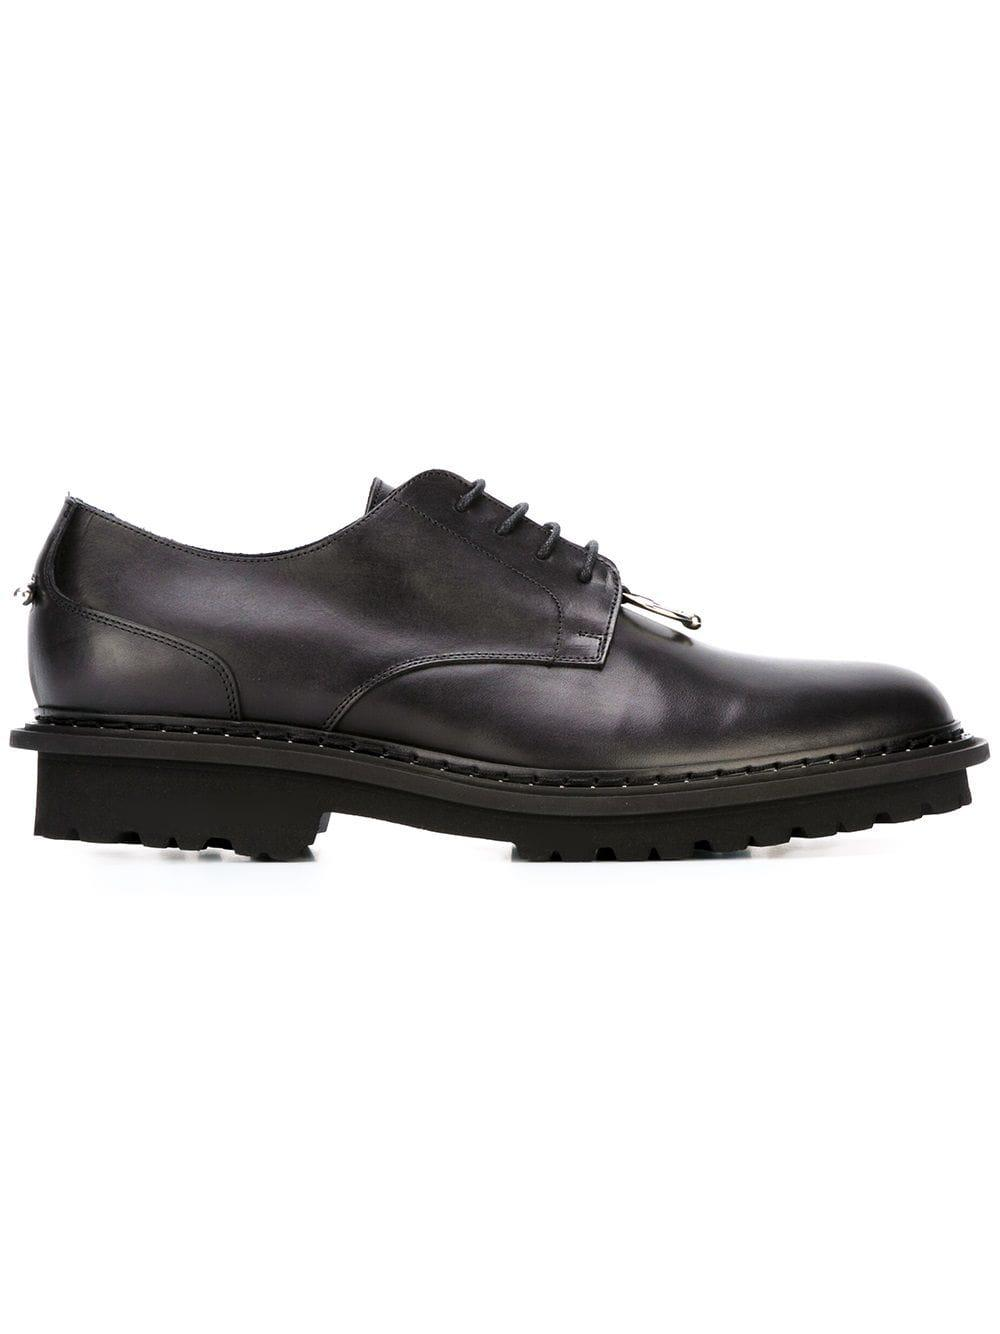 Neil Barrett Leather Piercing Detail Derby Shoes in Black for Men